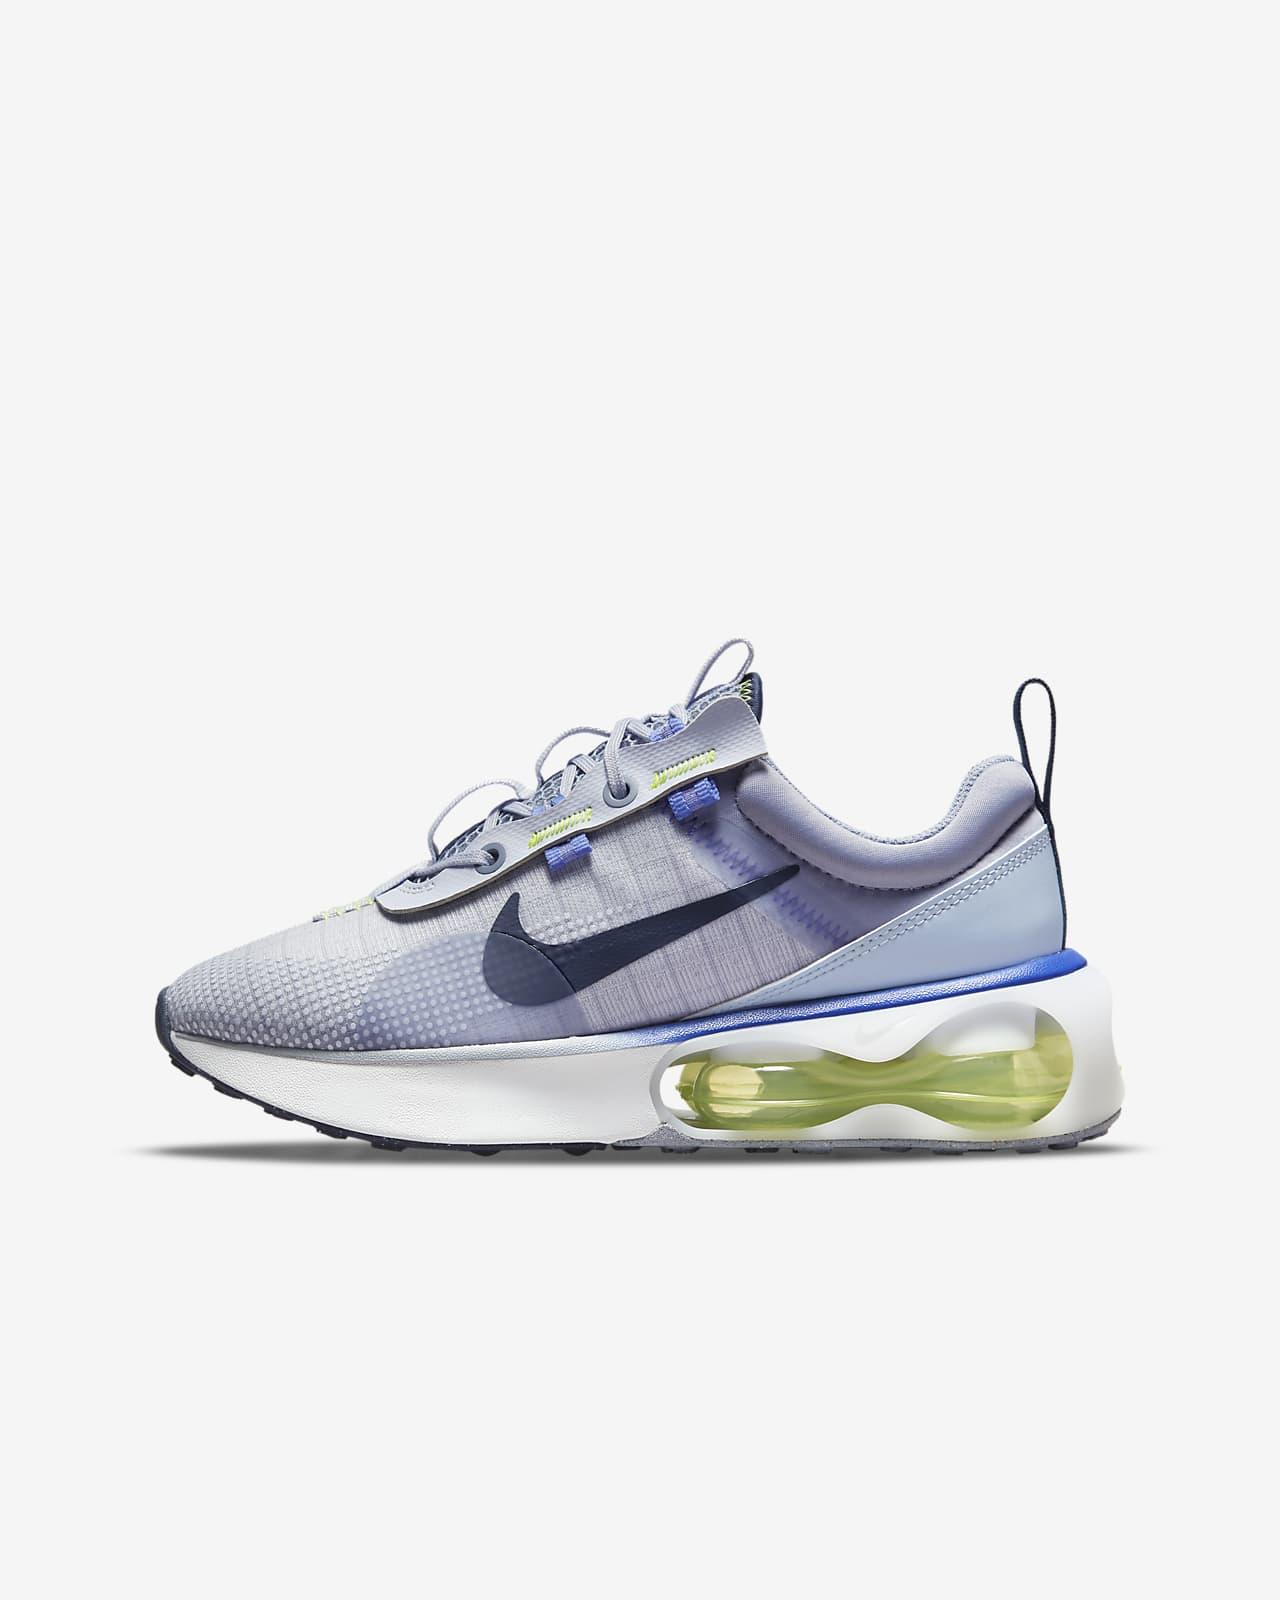 Sko Nike Air Max 2021 för ungdom